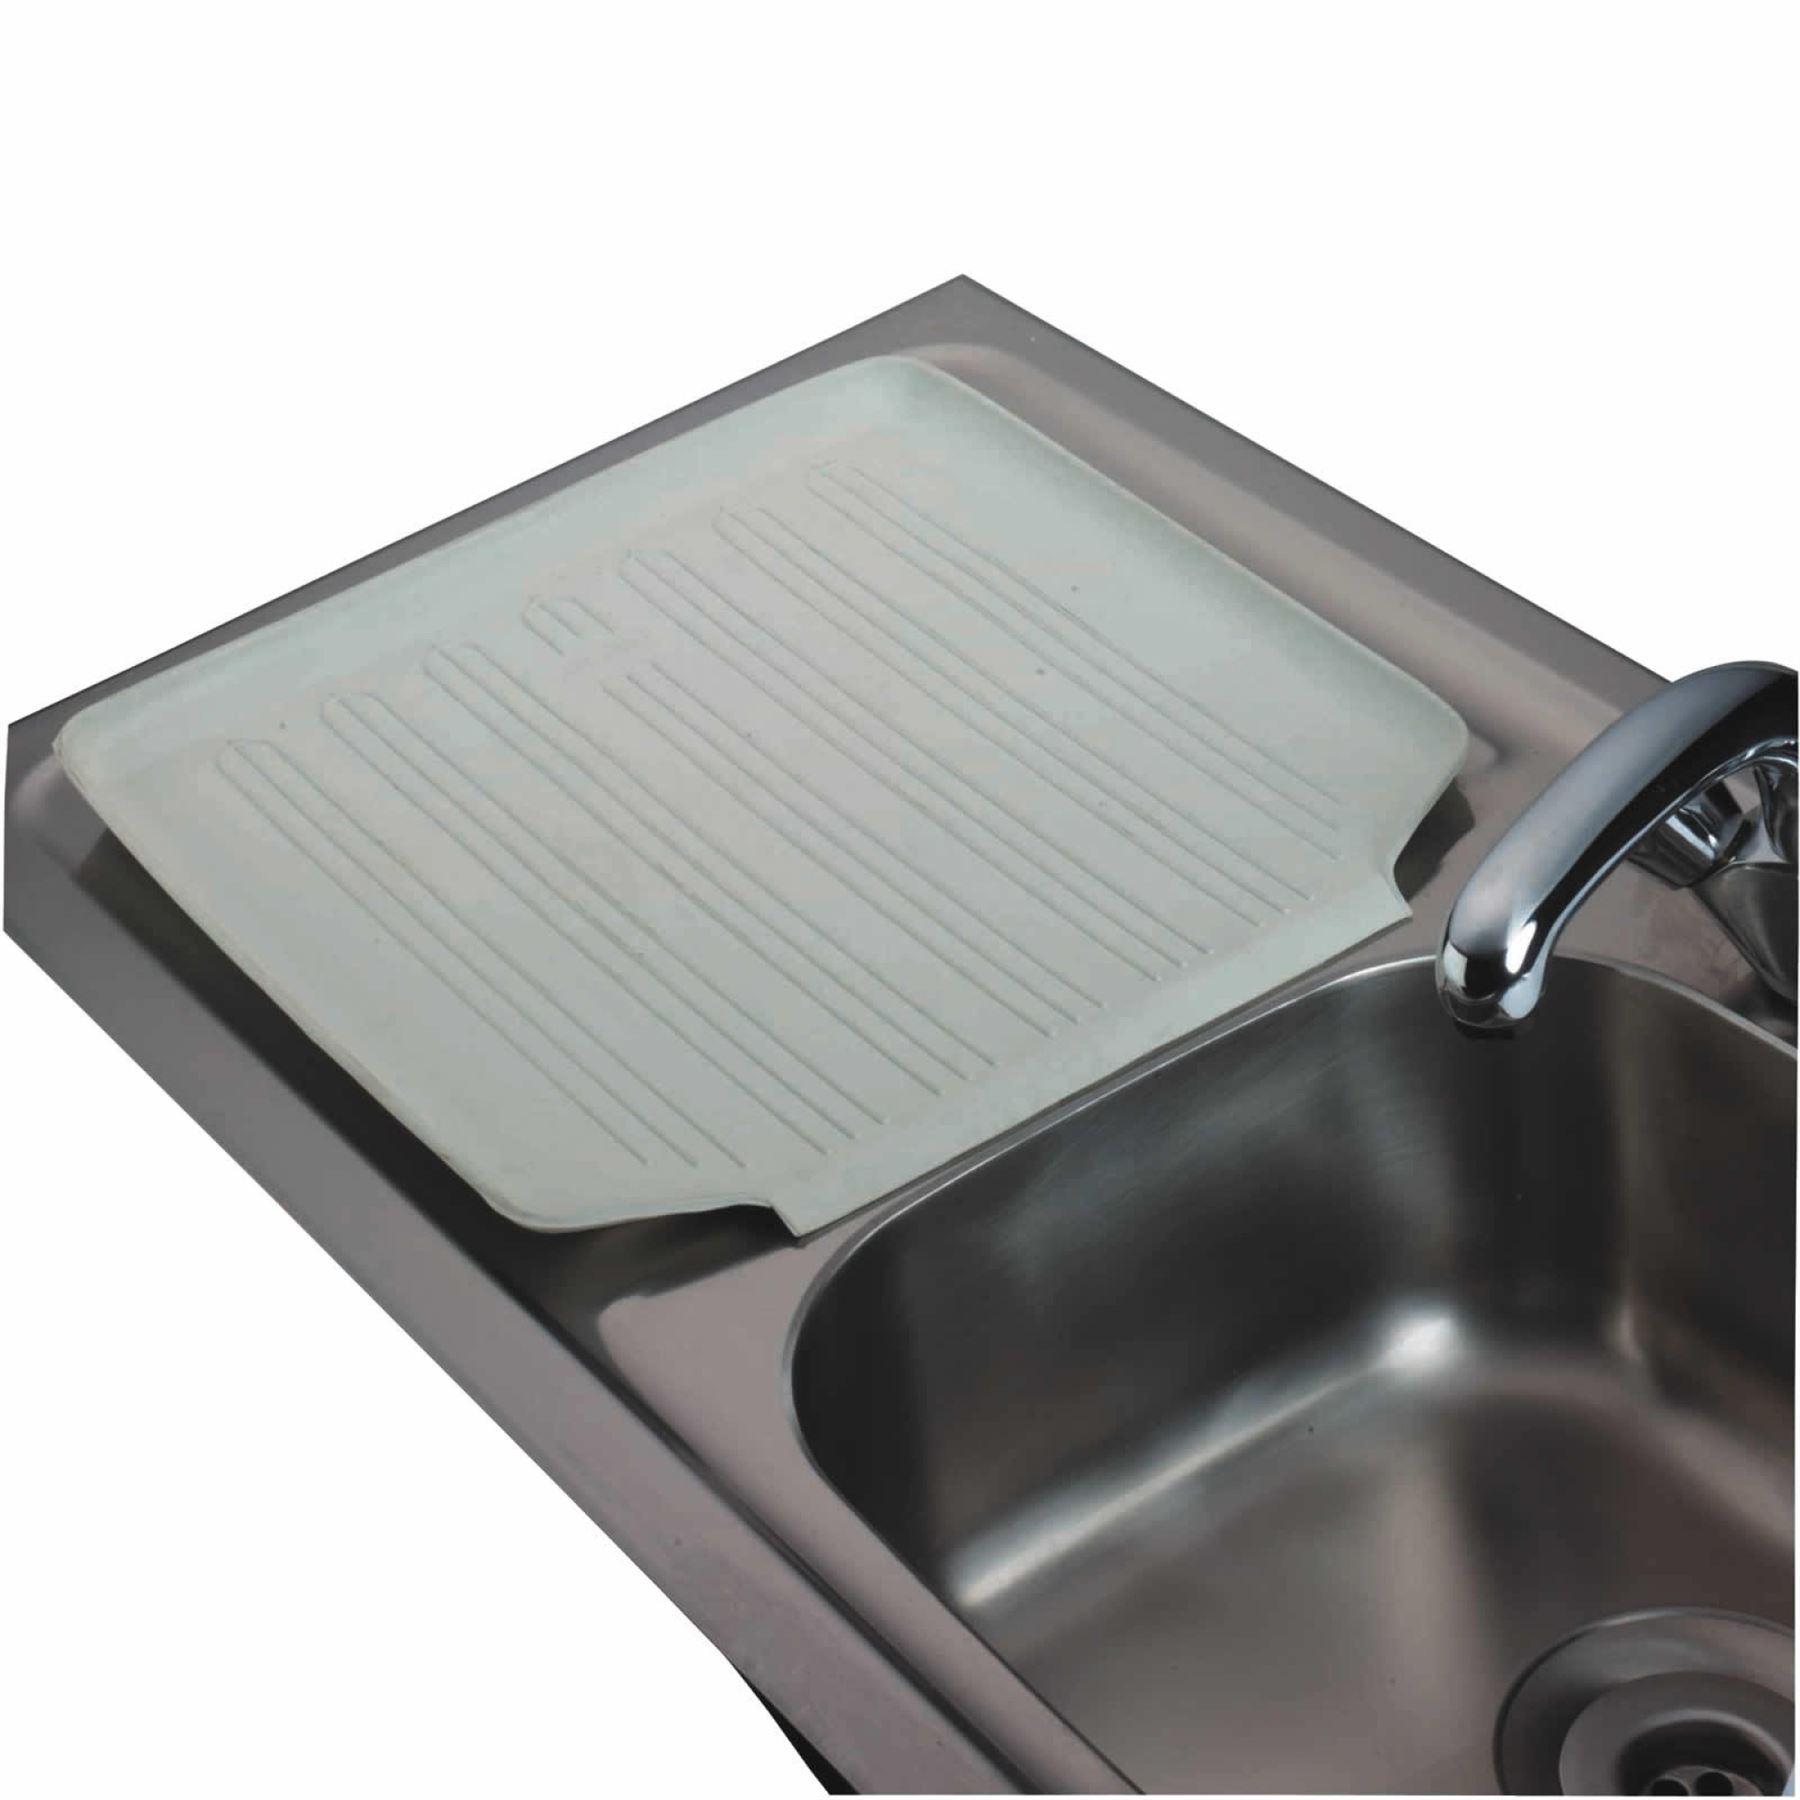 Kitchen Craft Rubber Sink Dish Drainer Draining Board Mat